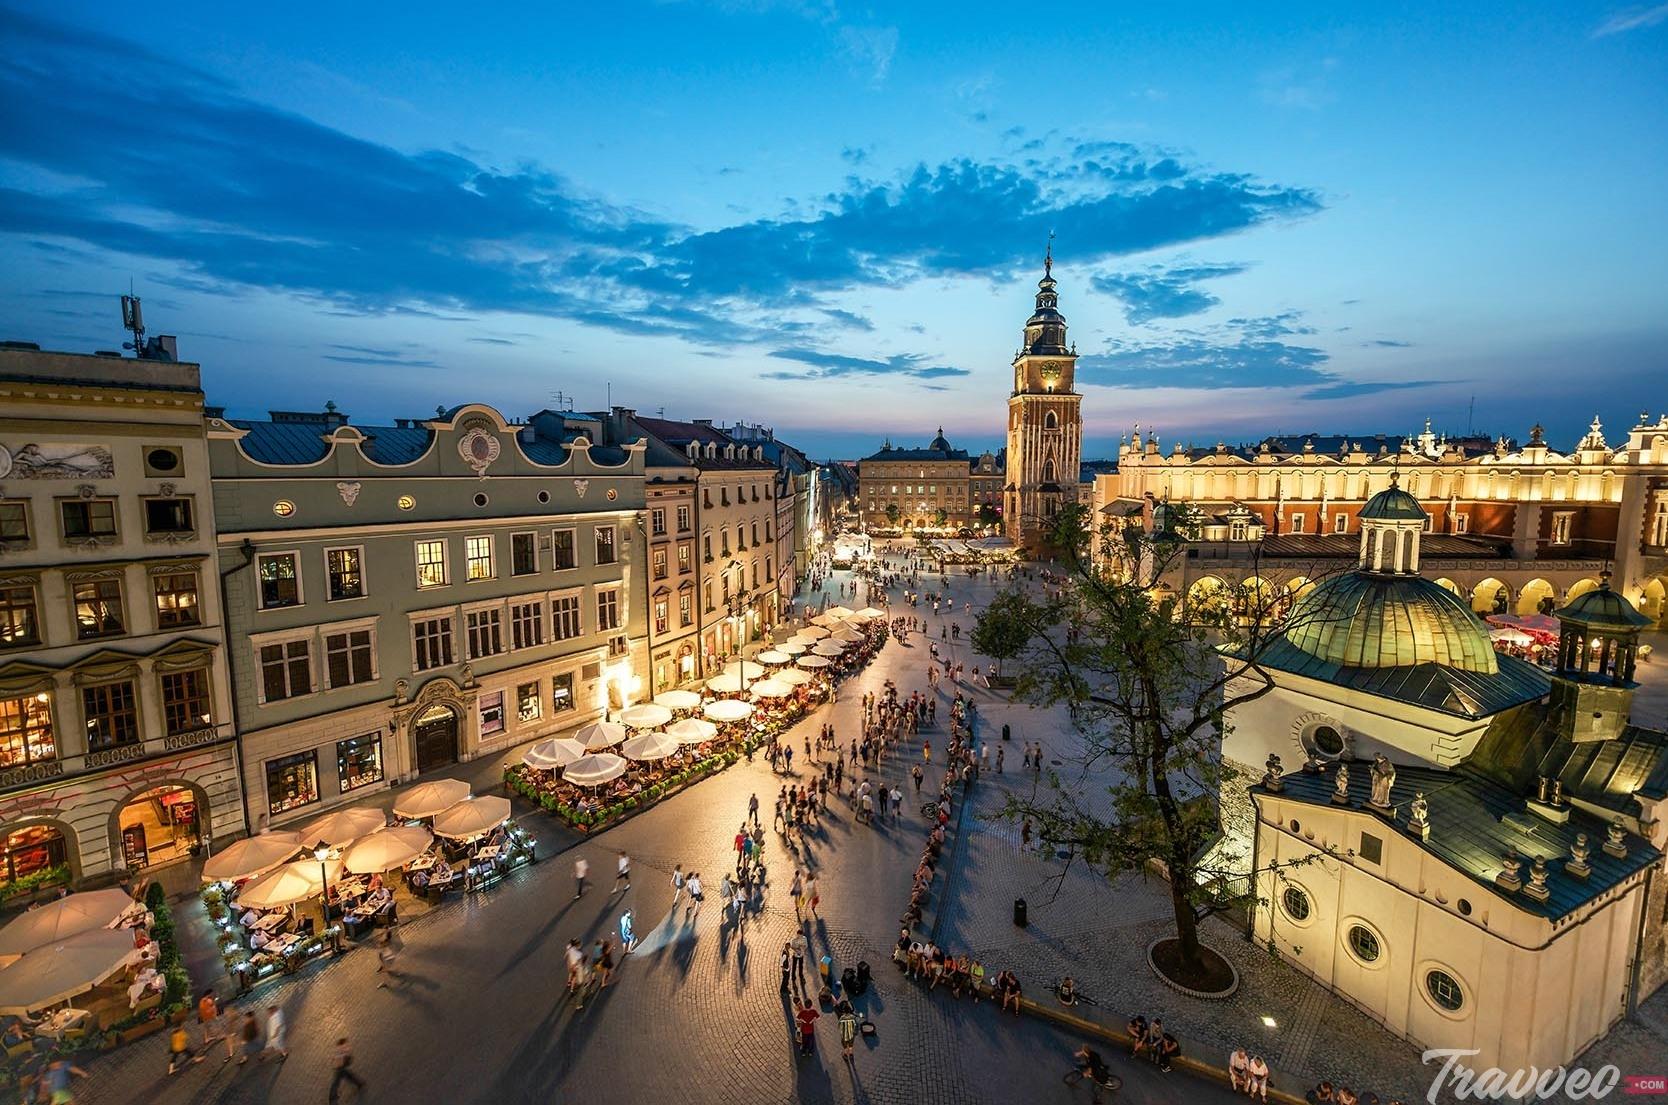 Historic Old Town Krakow